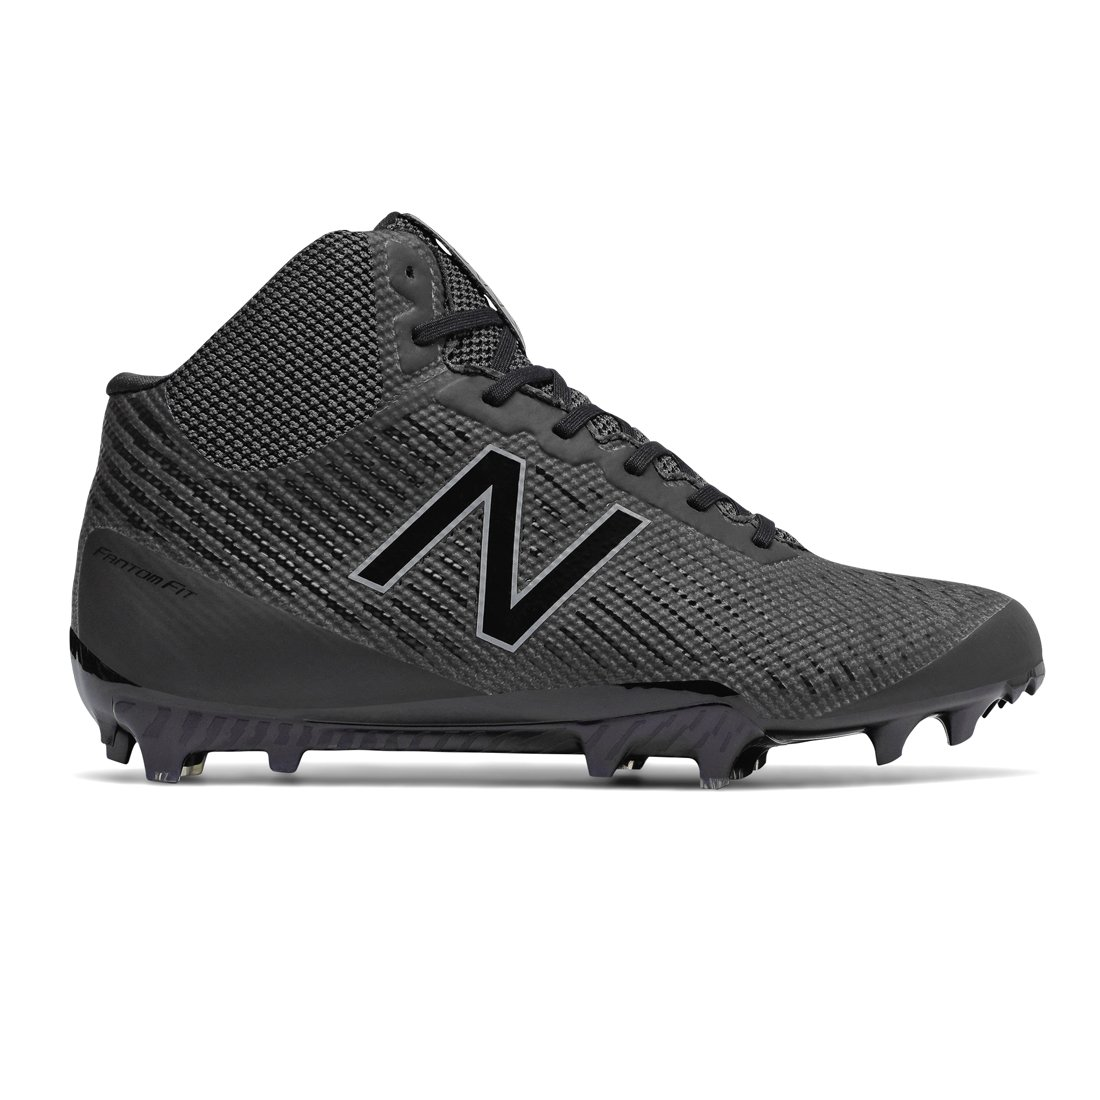 7a54984ec Amazon.com  New Balance Burn X Mid Lacrosse Cleats  Sports   Outdoors